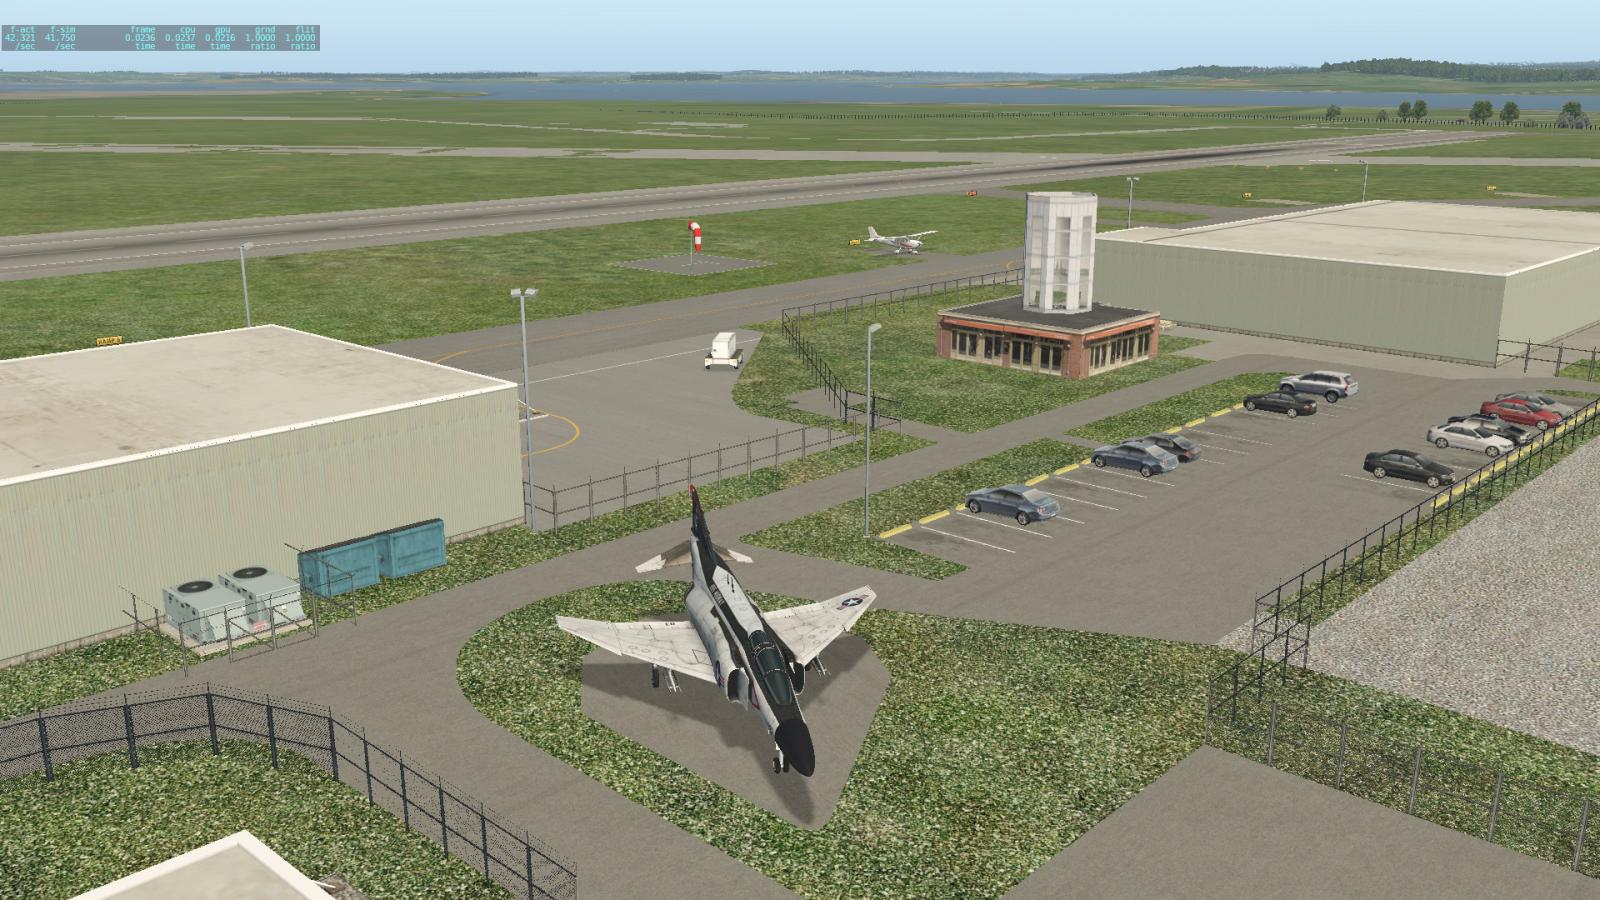 Scenery Gateway (Lego Bricks) United Kindom Airports - Page 8